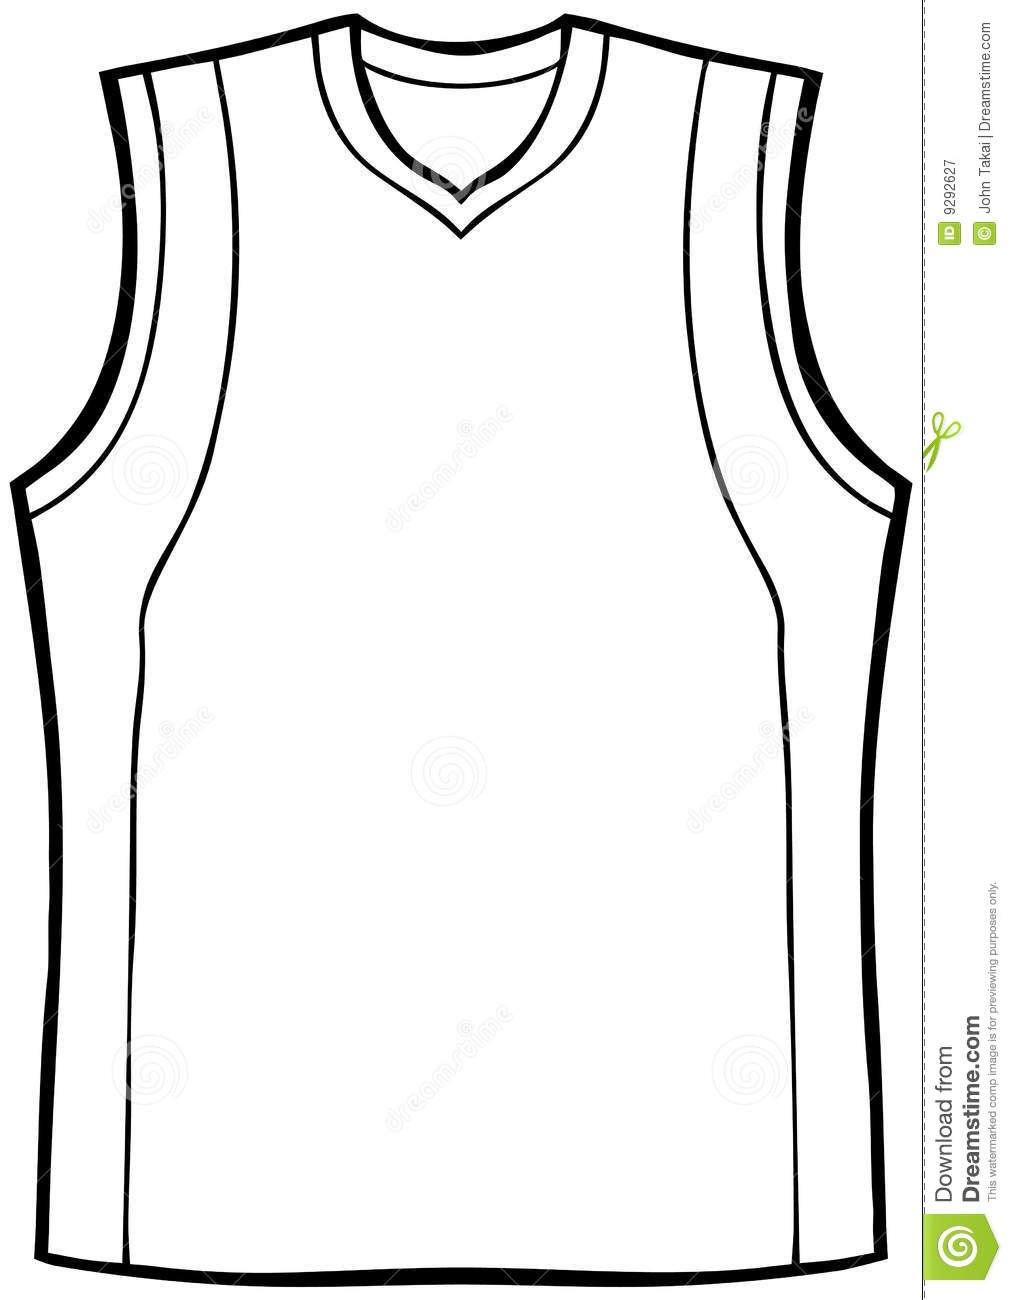 Blank Basketball Jersey Clipart  Free Download Best Blank Regarding Blank Basketball Uniform Template